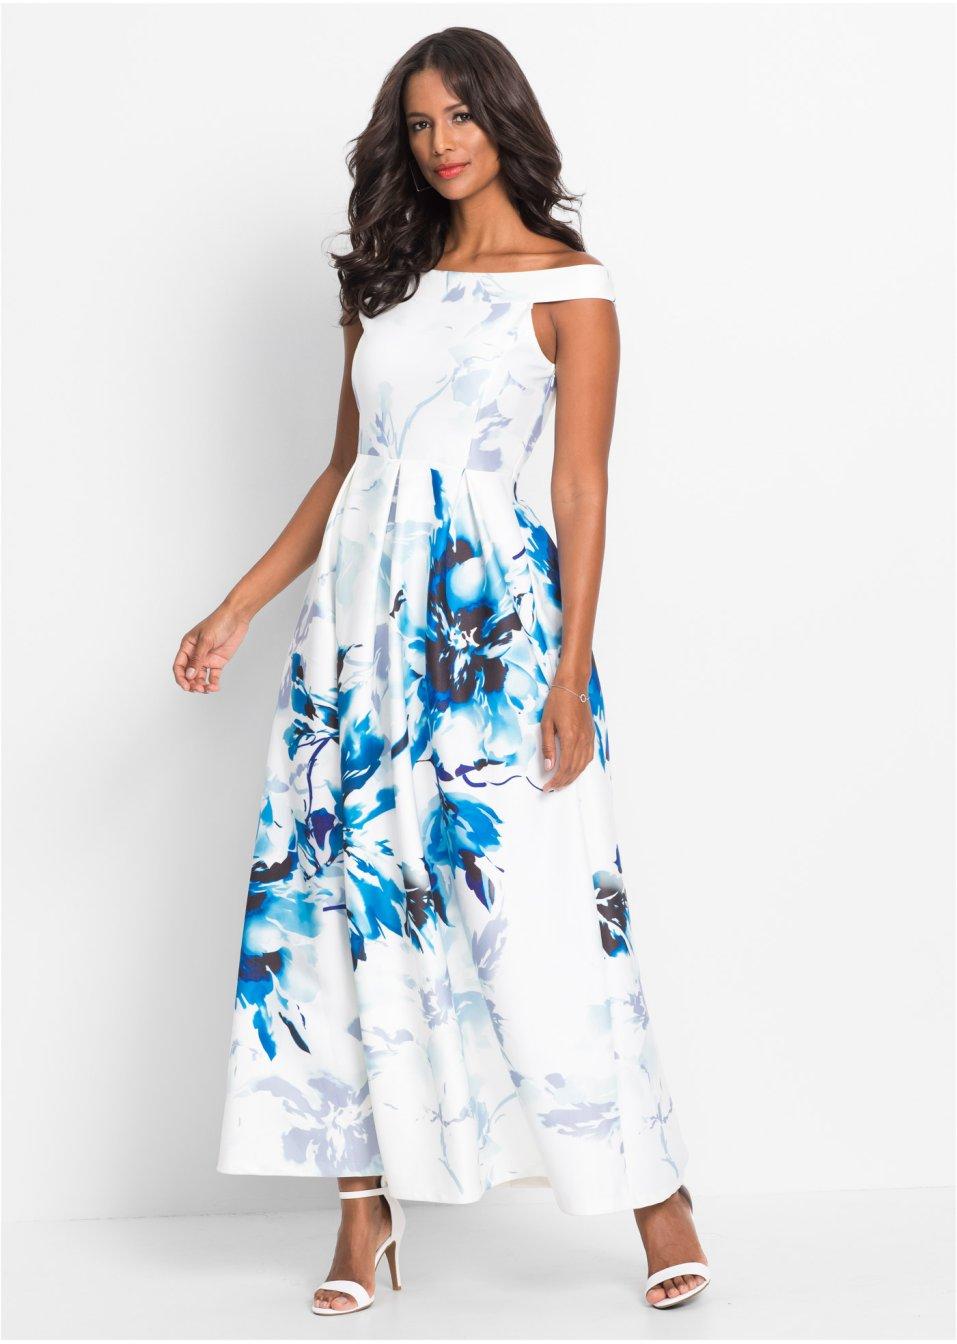 Langes Kleid mit Carmen-Ausschnitt - weiss/blau geblümt